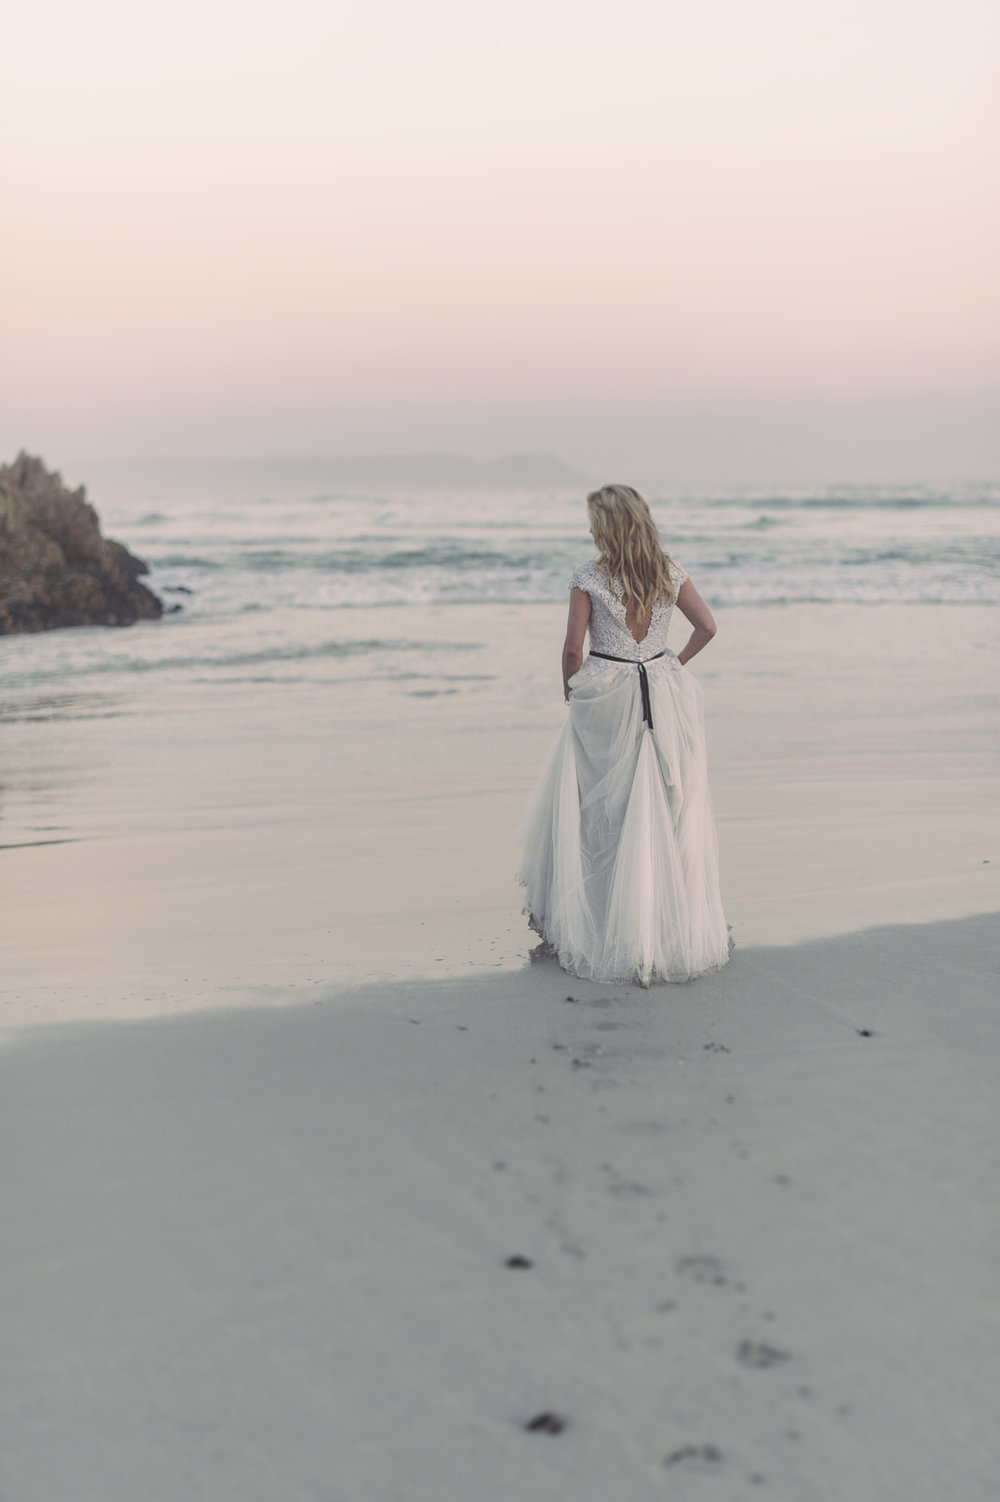 RyanParker_Wedding_Photographer_CapeTown_Hermanus_StyledShoot_DSC_6140.jpg